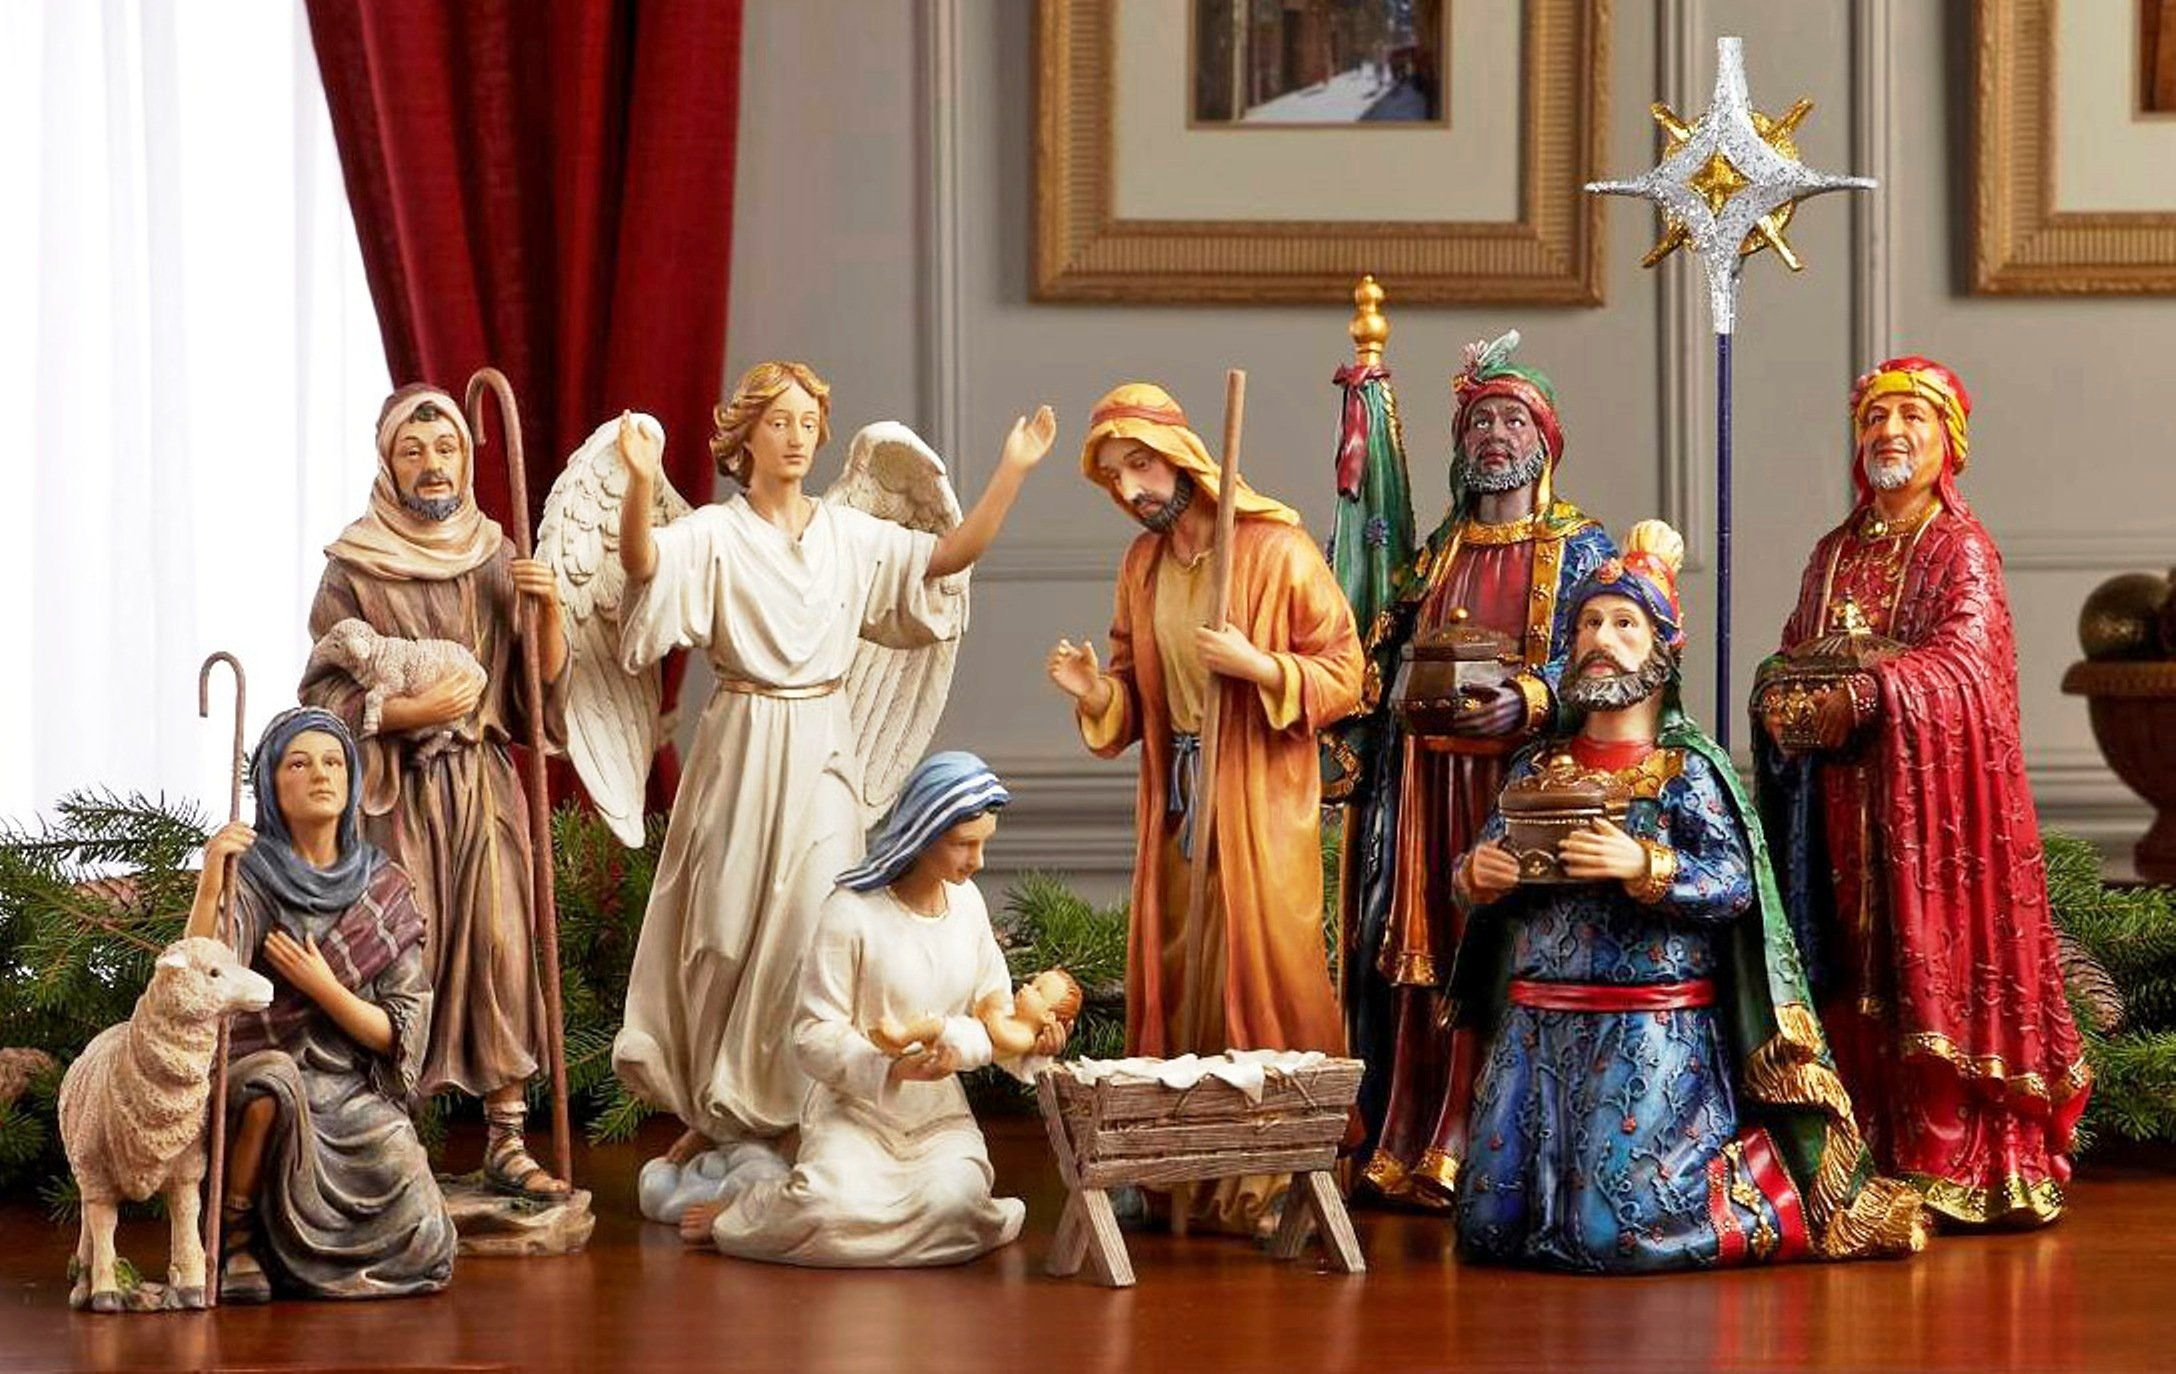 145 Resin Nice Detail Medium Large Size Christmas Nativity Set Full 10 Inch Real Life Nativity Set Christmas Nativity